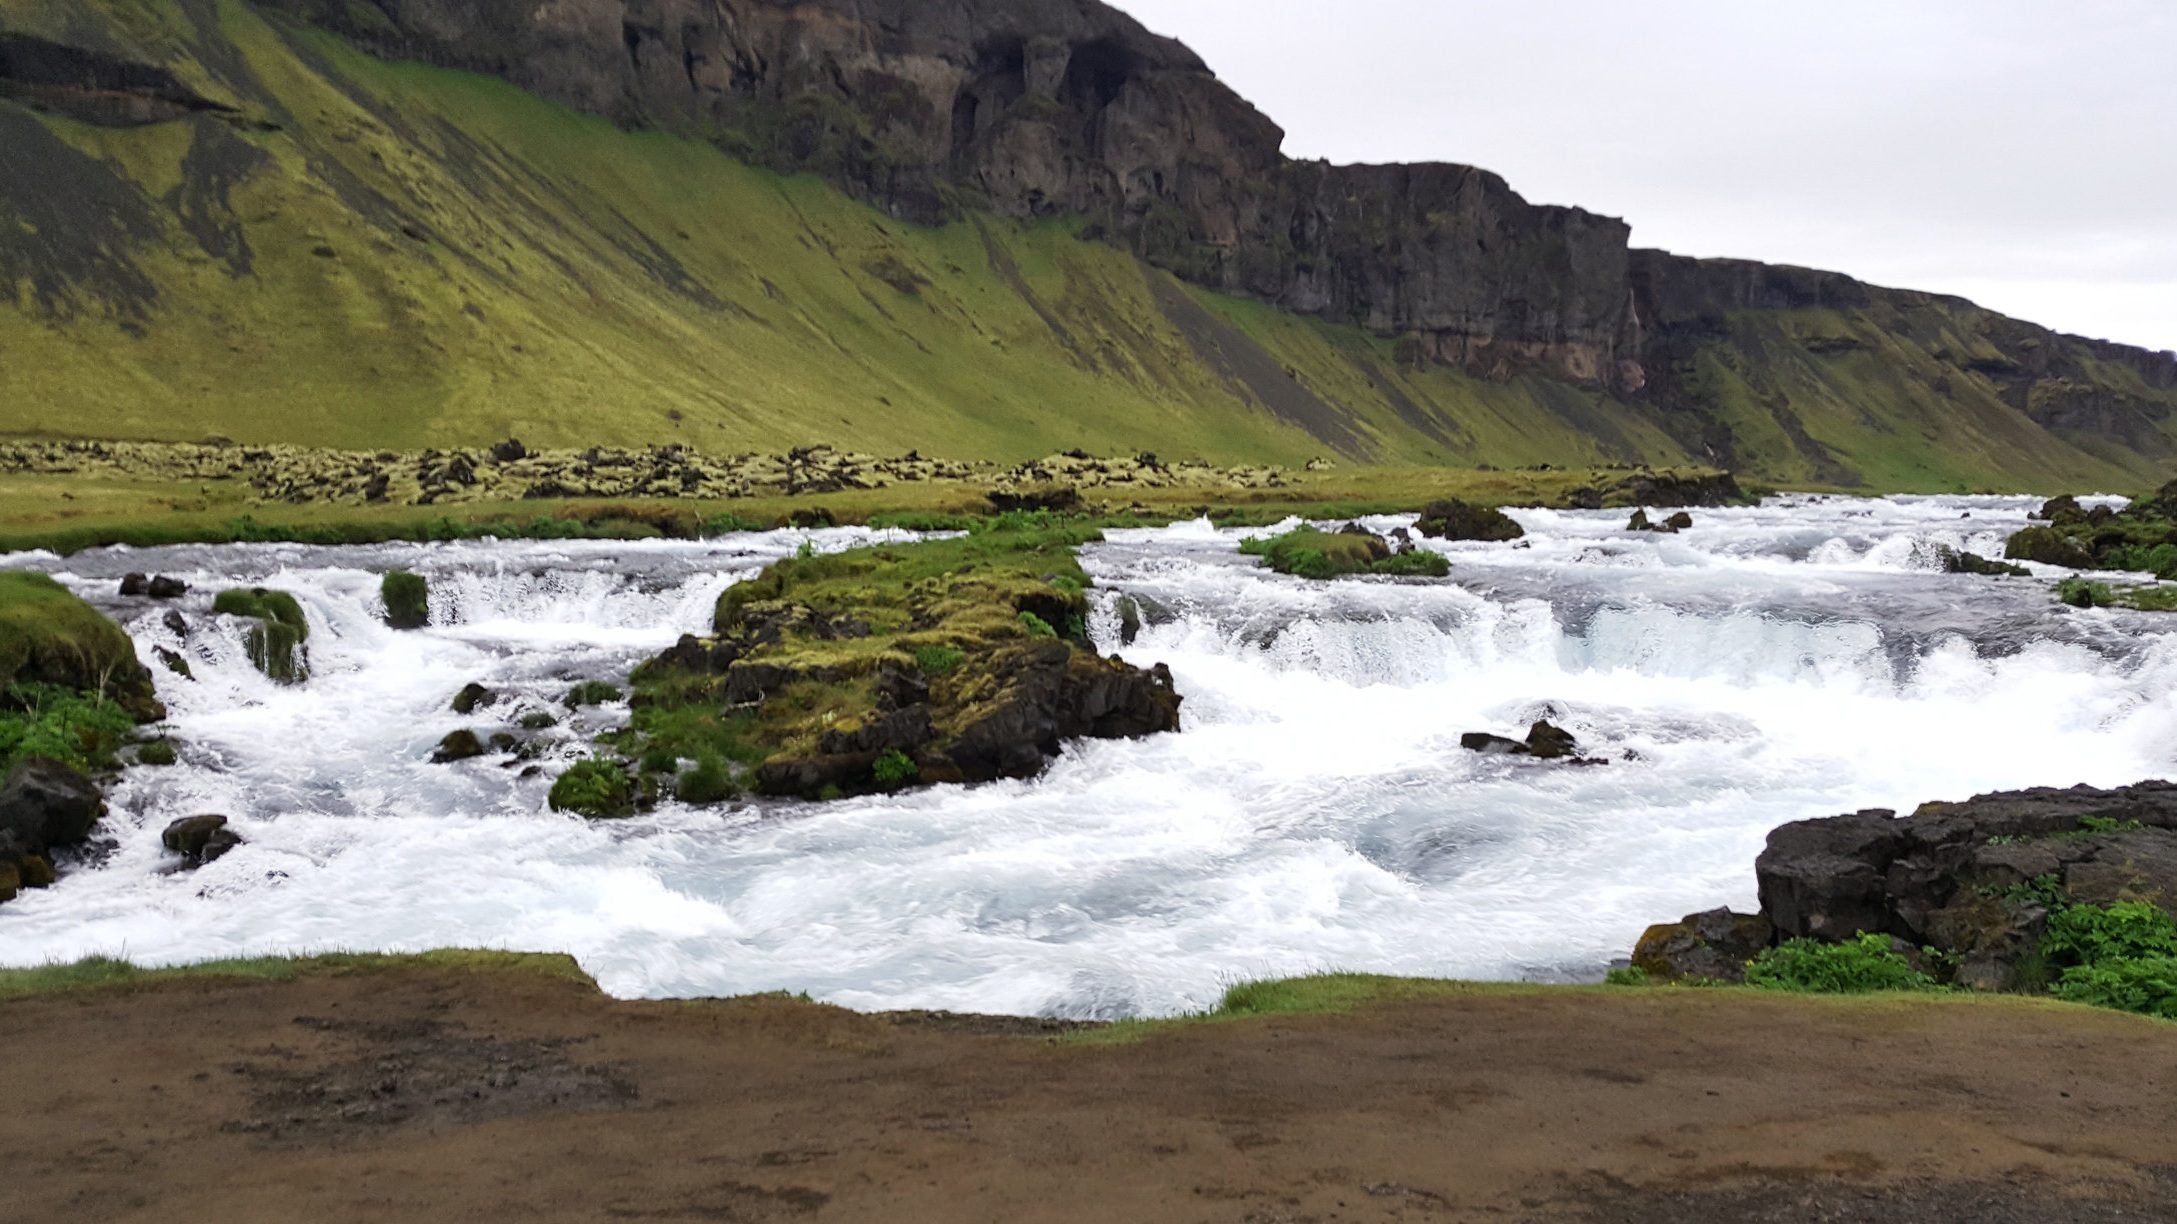 Roadside rapids in Southern Iceland